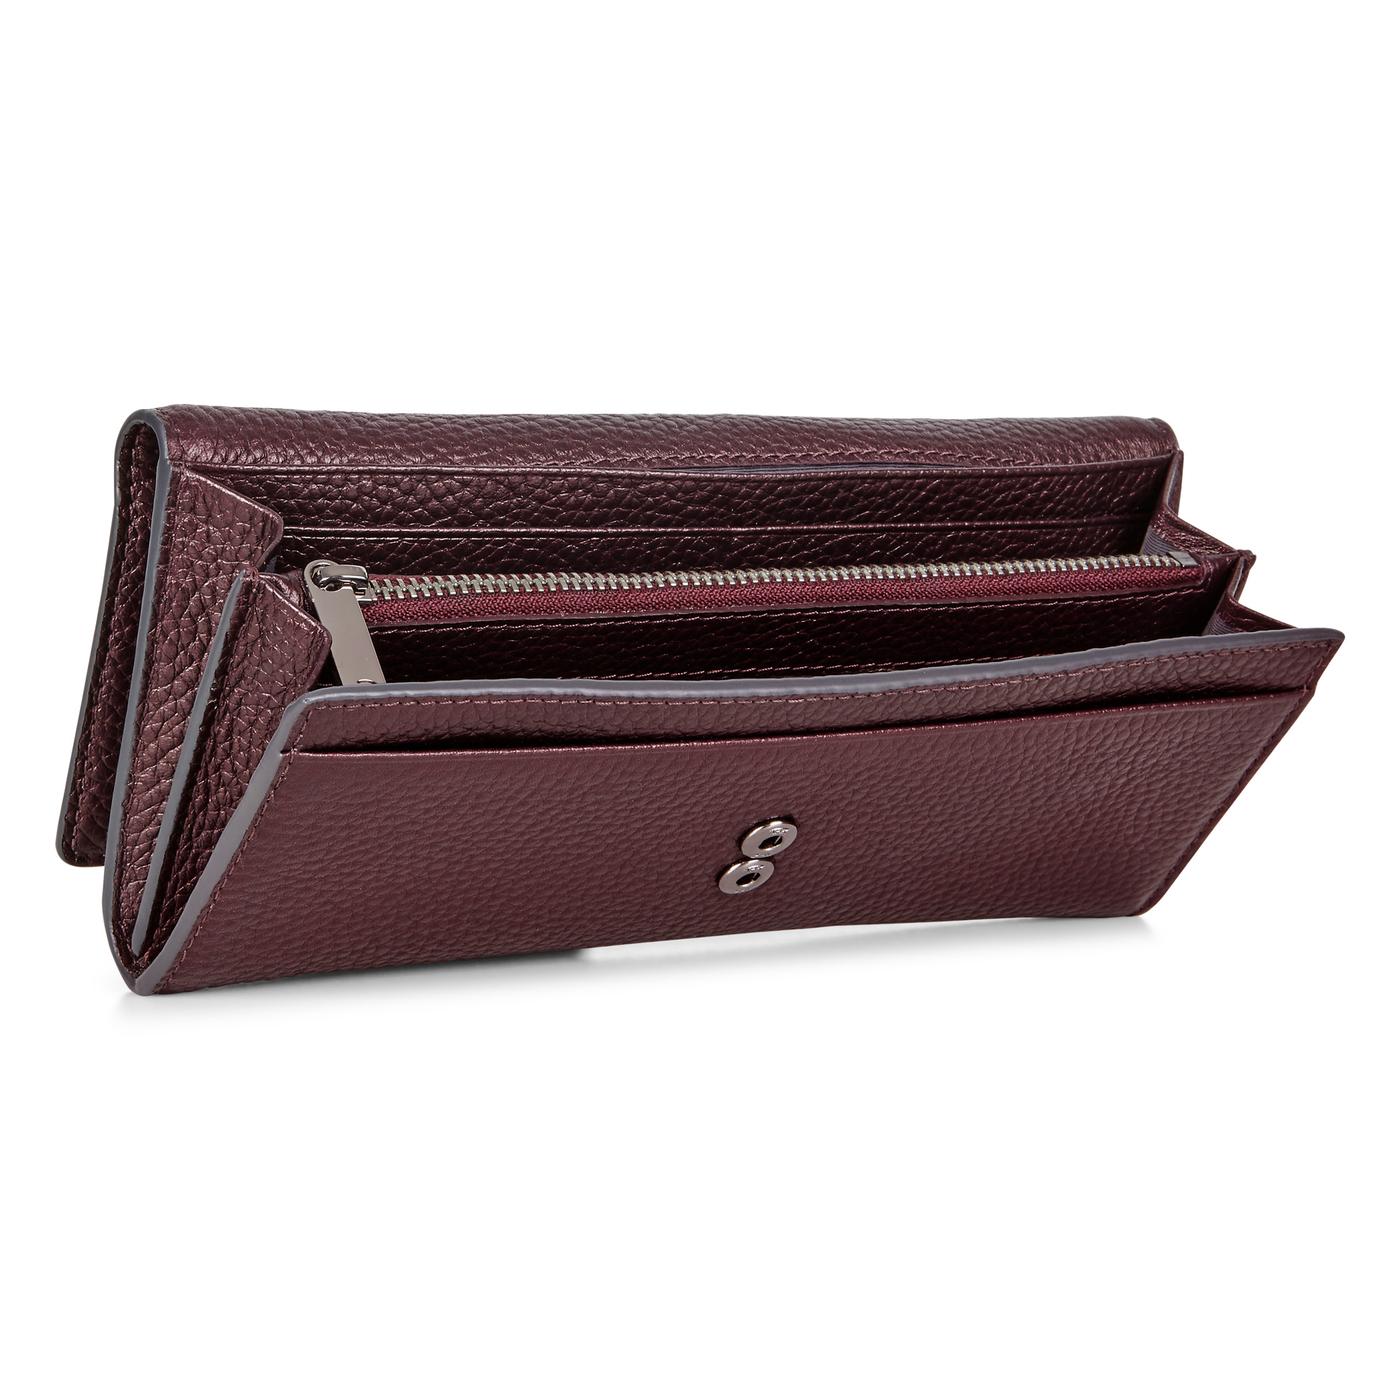 ECCO LINNEA Metallic Continental Wallet